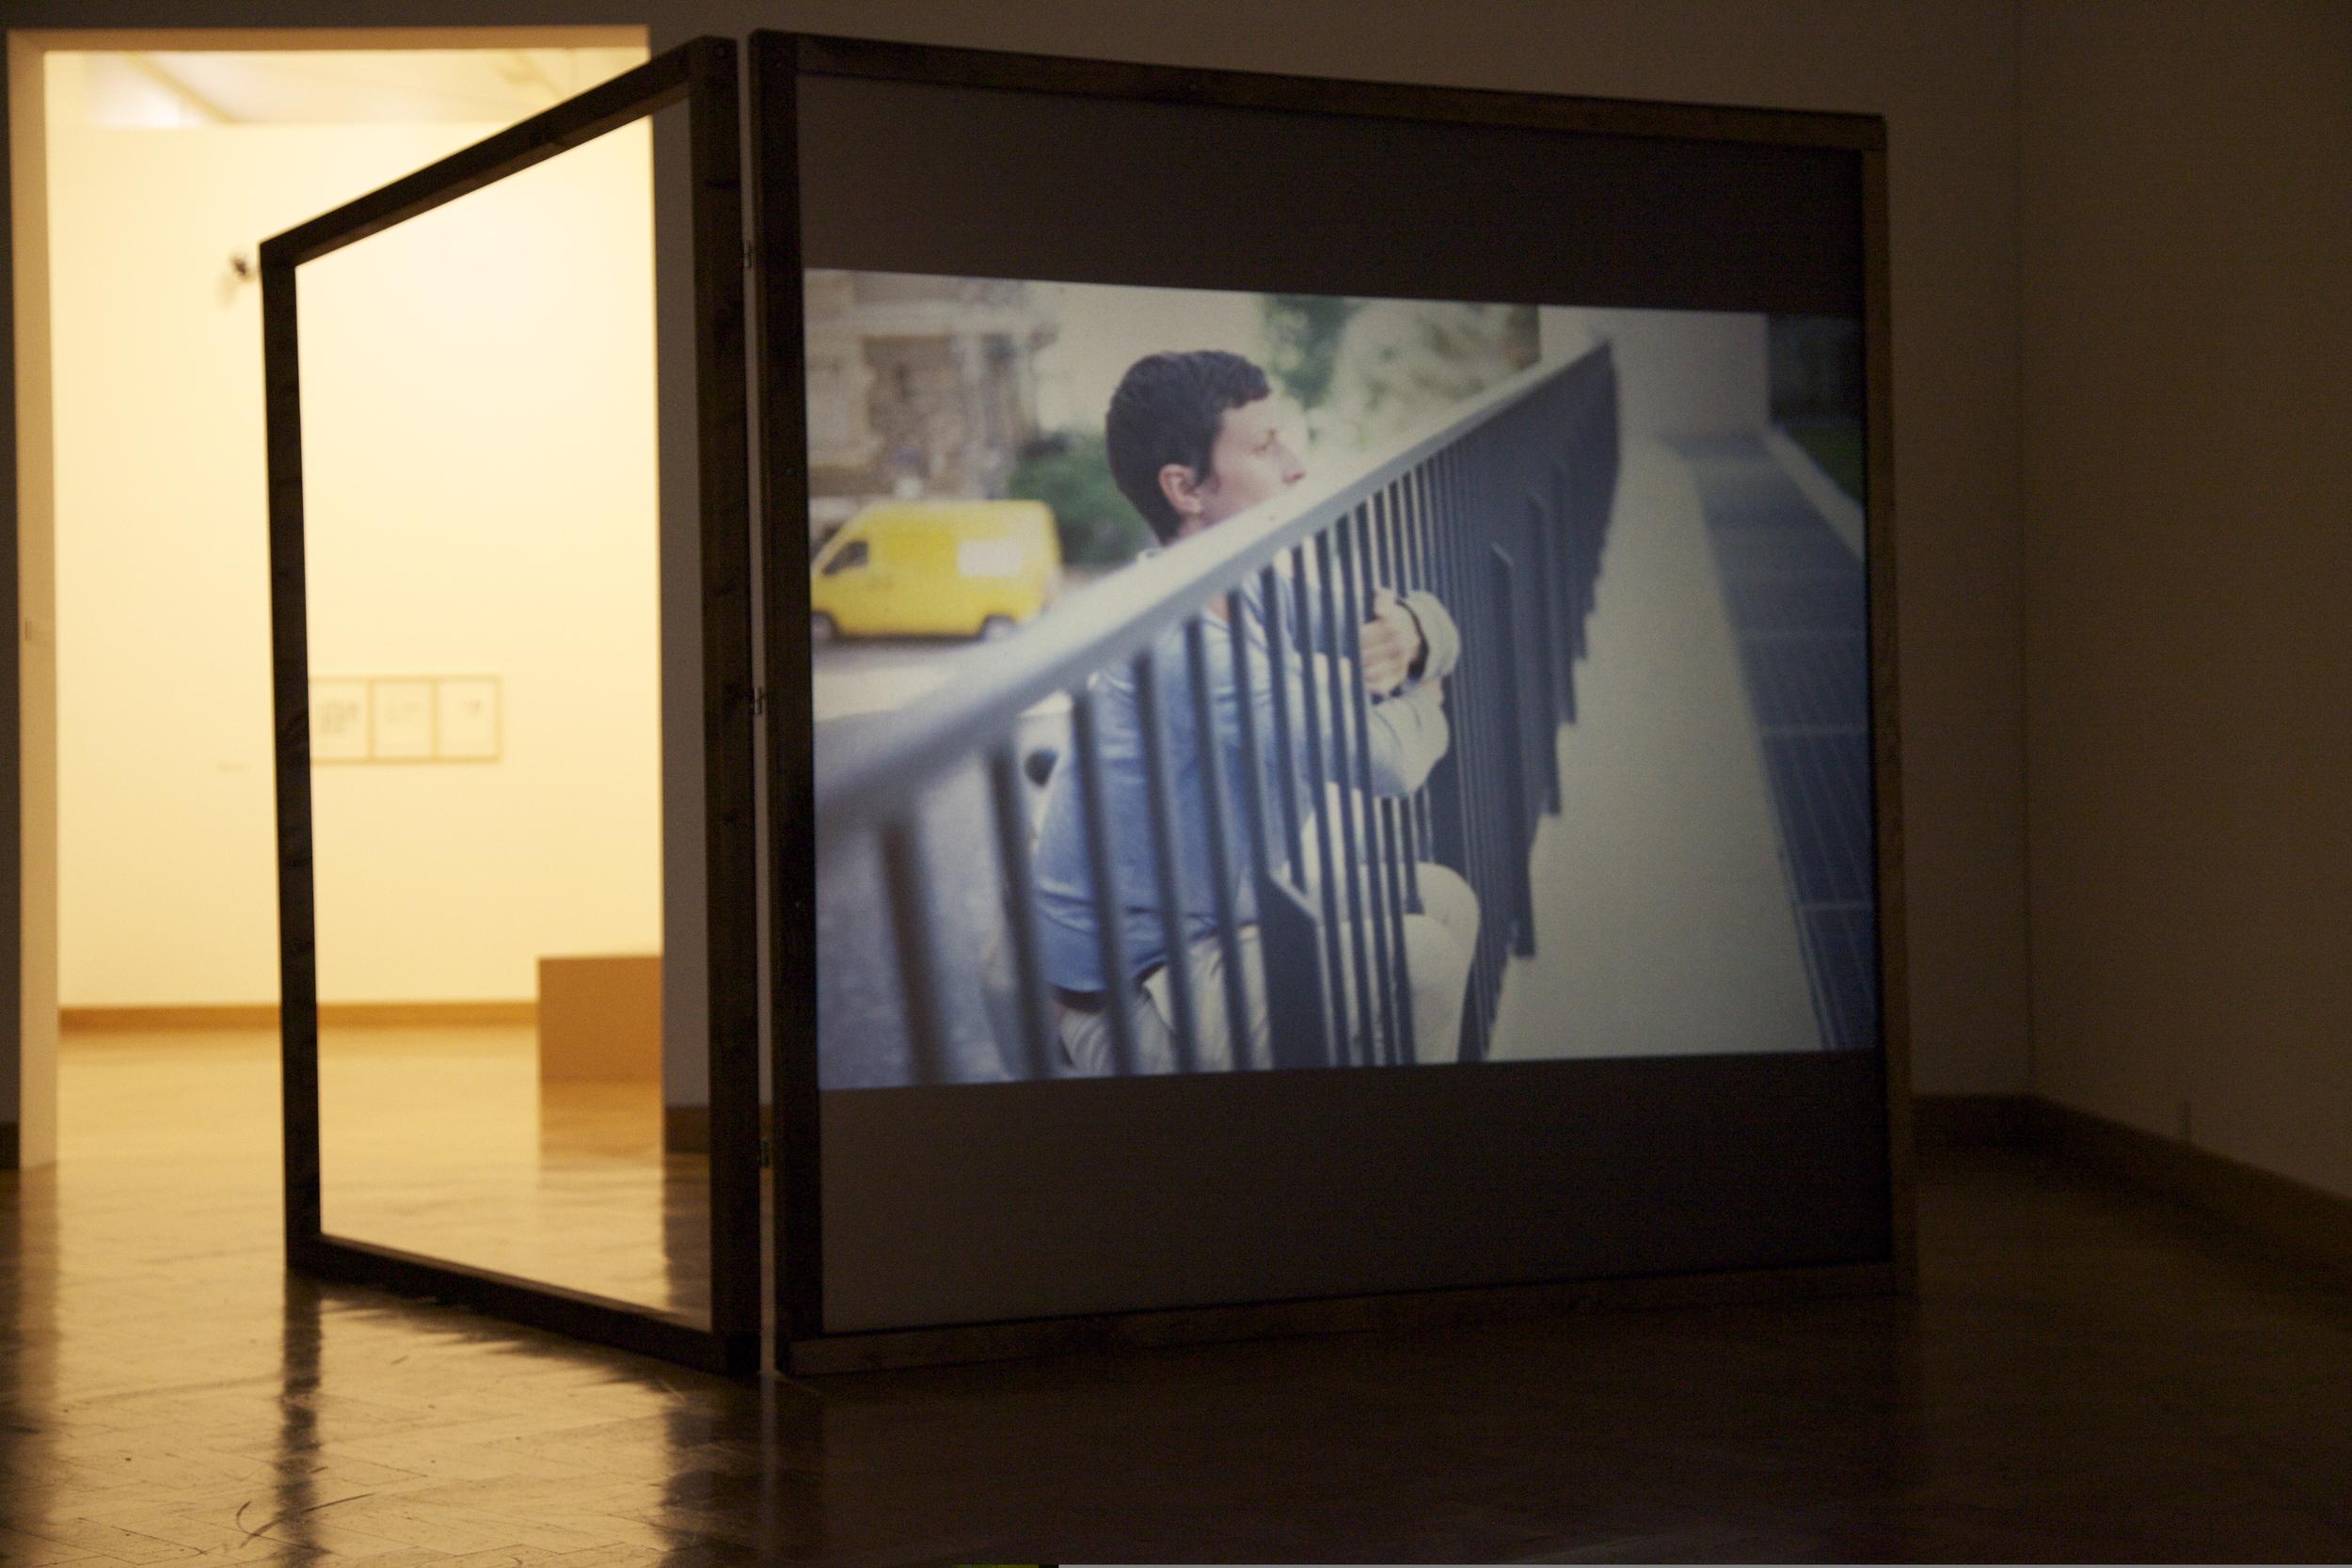 Anne Sylvie Henchoz, Conversation entre masses II, 2012, installation view, projection of slides on both sides screen, wooden structure of 186 x 186 cm.Exhibition view Accrochage vaud 13, Musée des B  eaux-Arts, Lausanne, 2013.